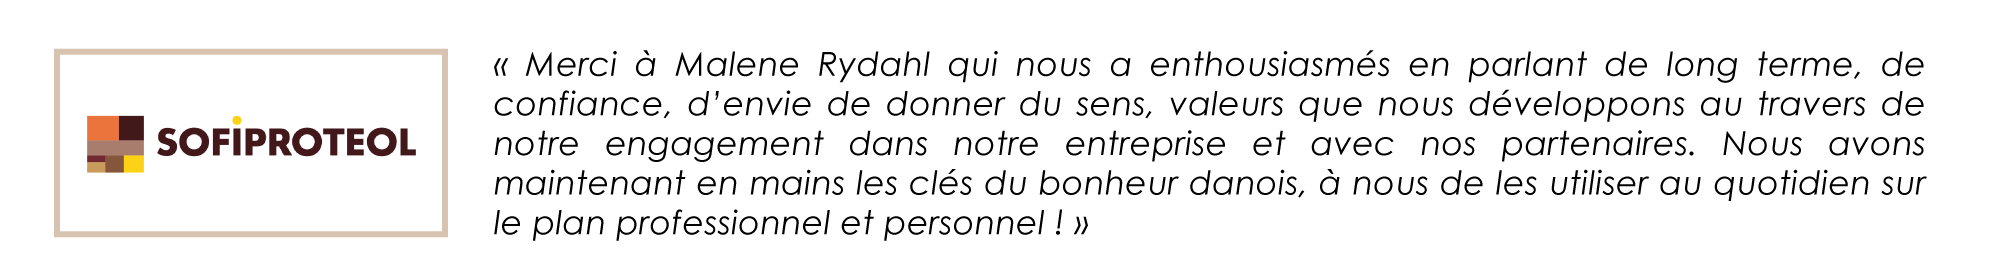 Sofiproteol